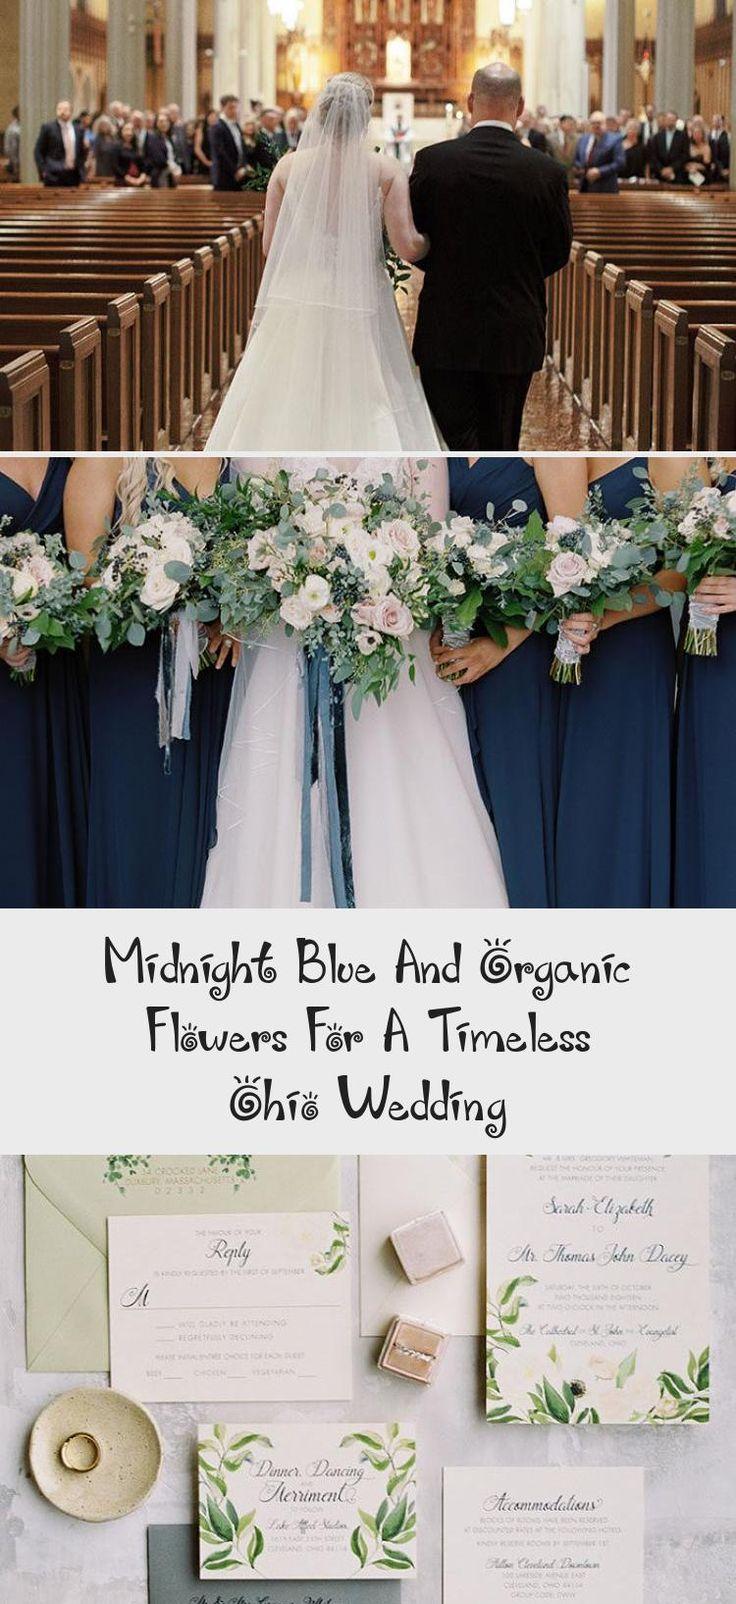 Midnight Blue Bridesmaid Dresses #RusticBridesmaidDresses #BridesmaidDressesMauve #ModestBridesmaidDresses #BridesmaidDressesBlue #BridesmaidDressesMidi